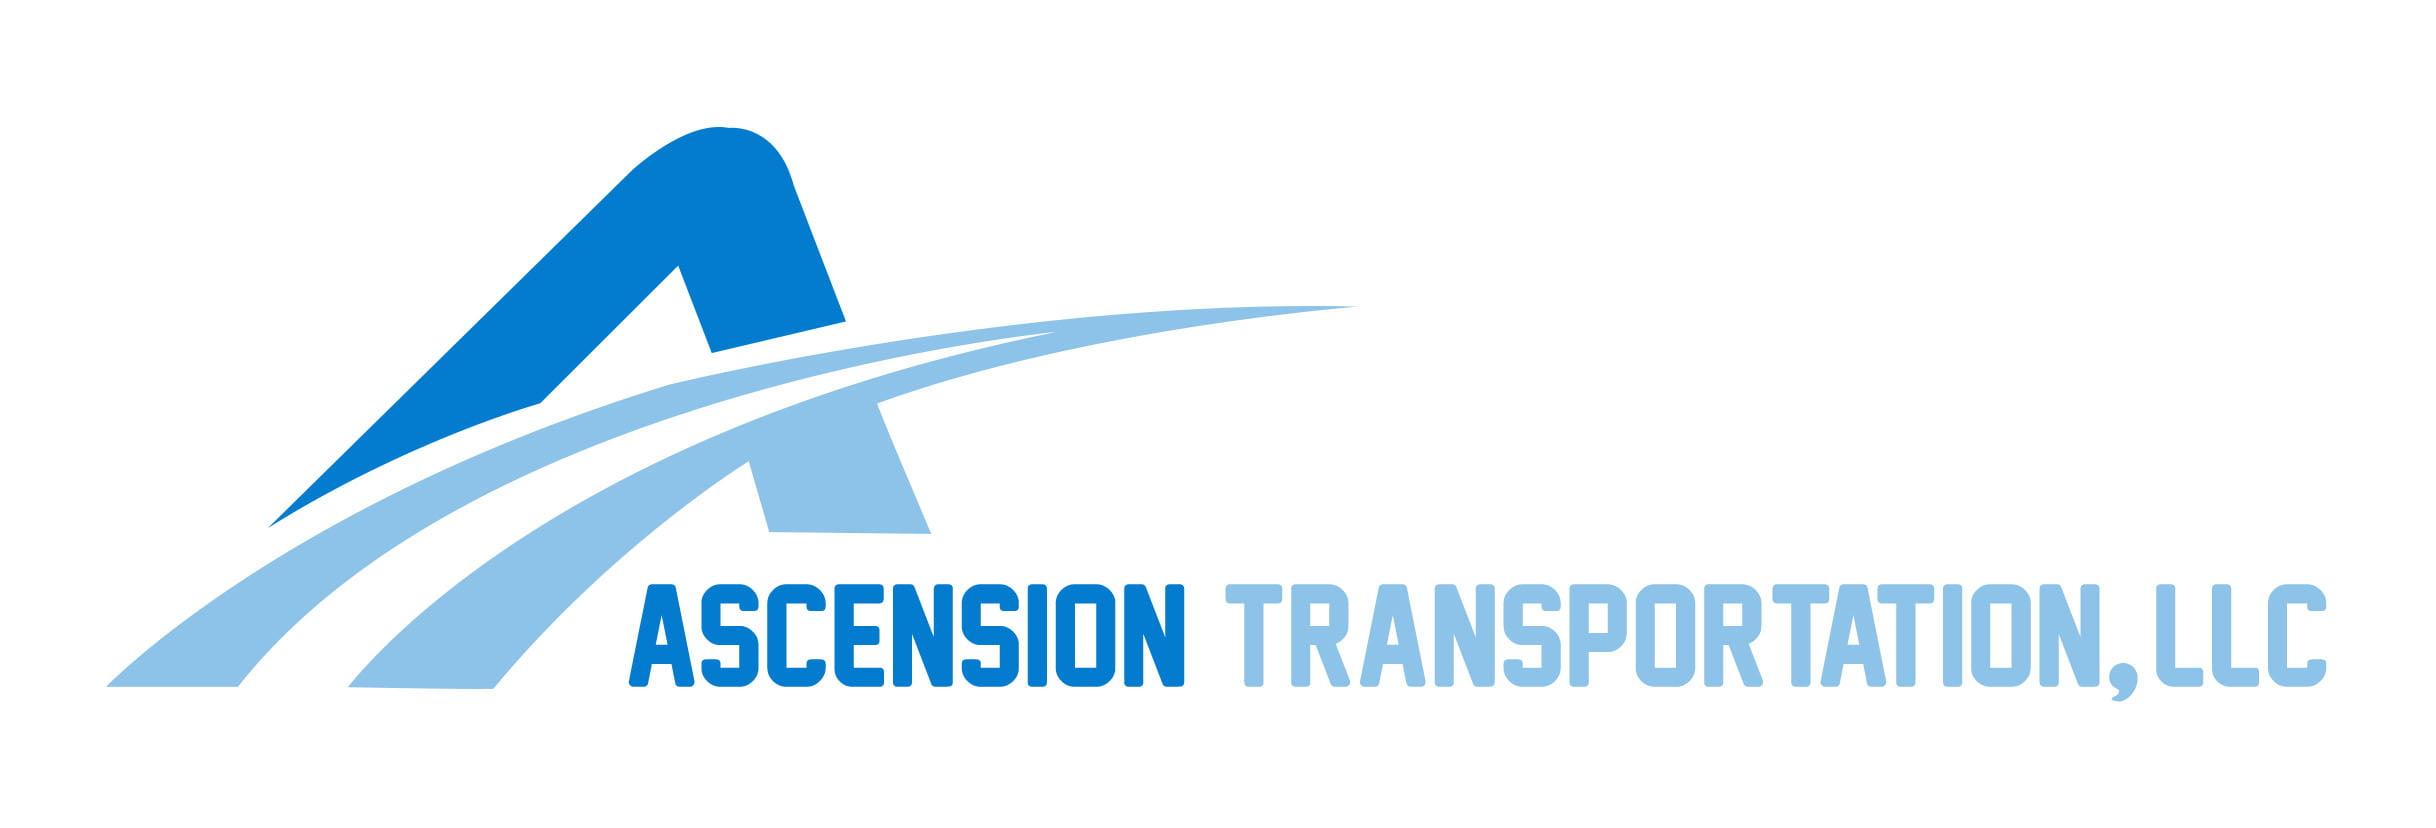 Ascension transportaion llc